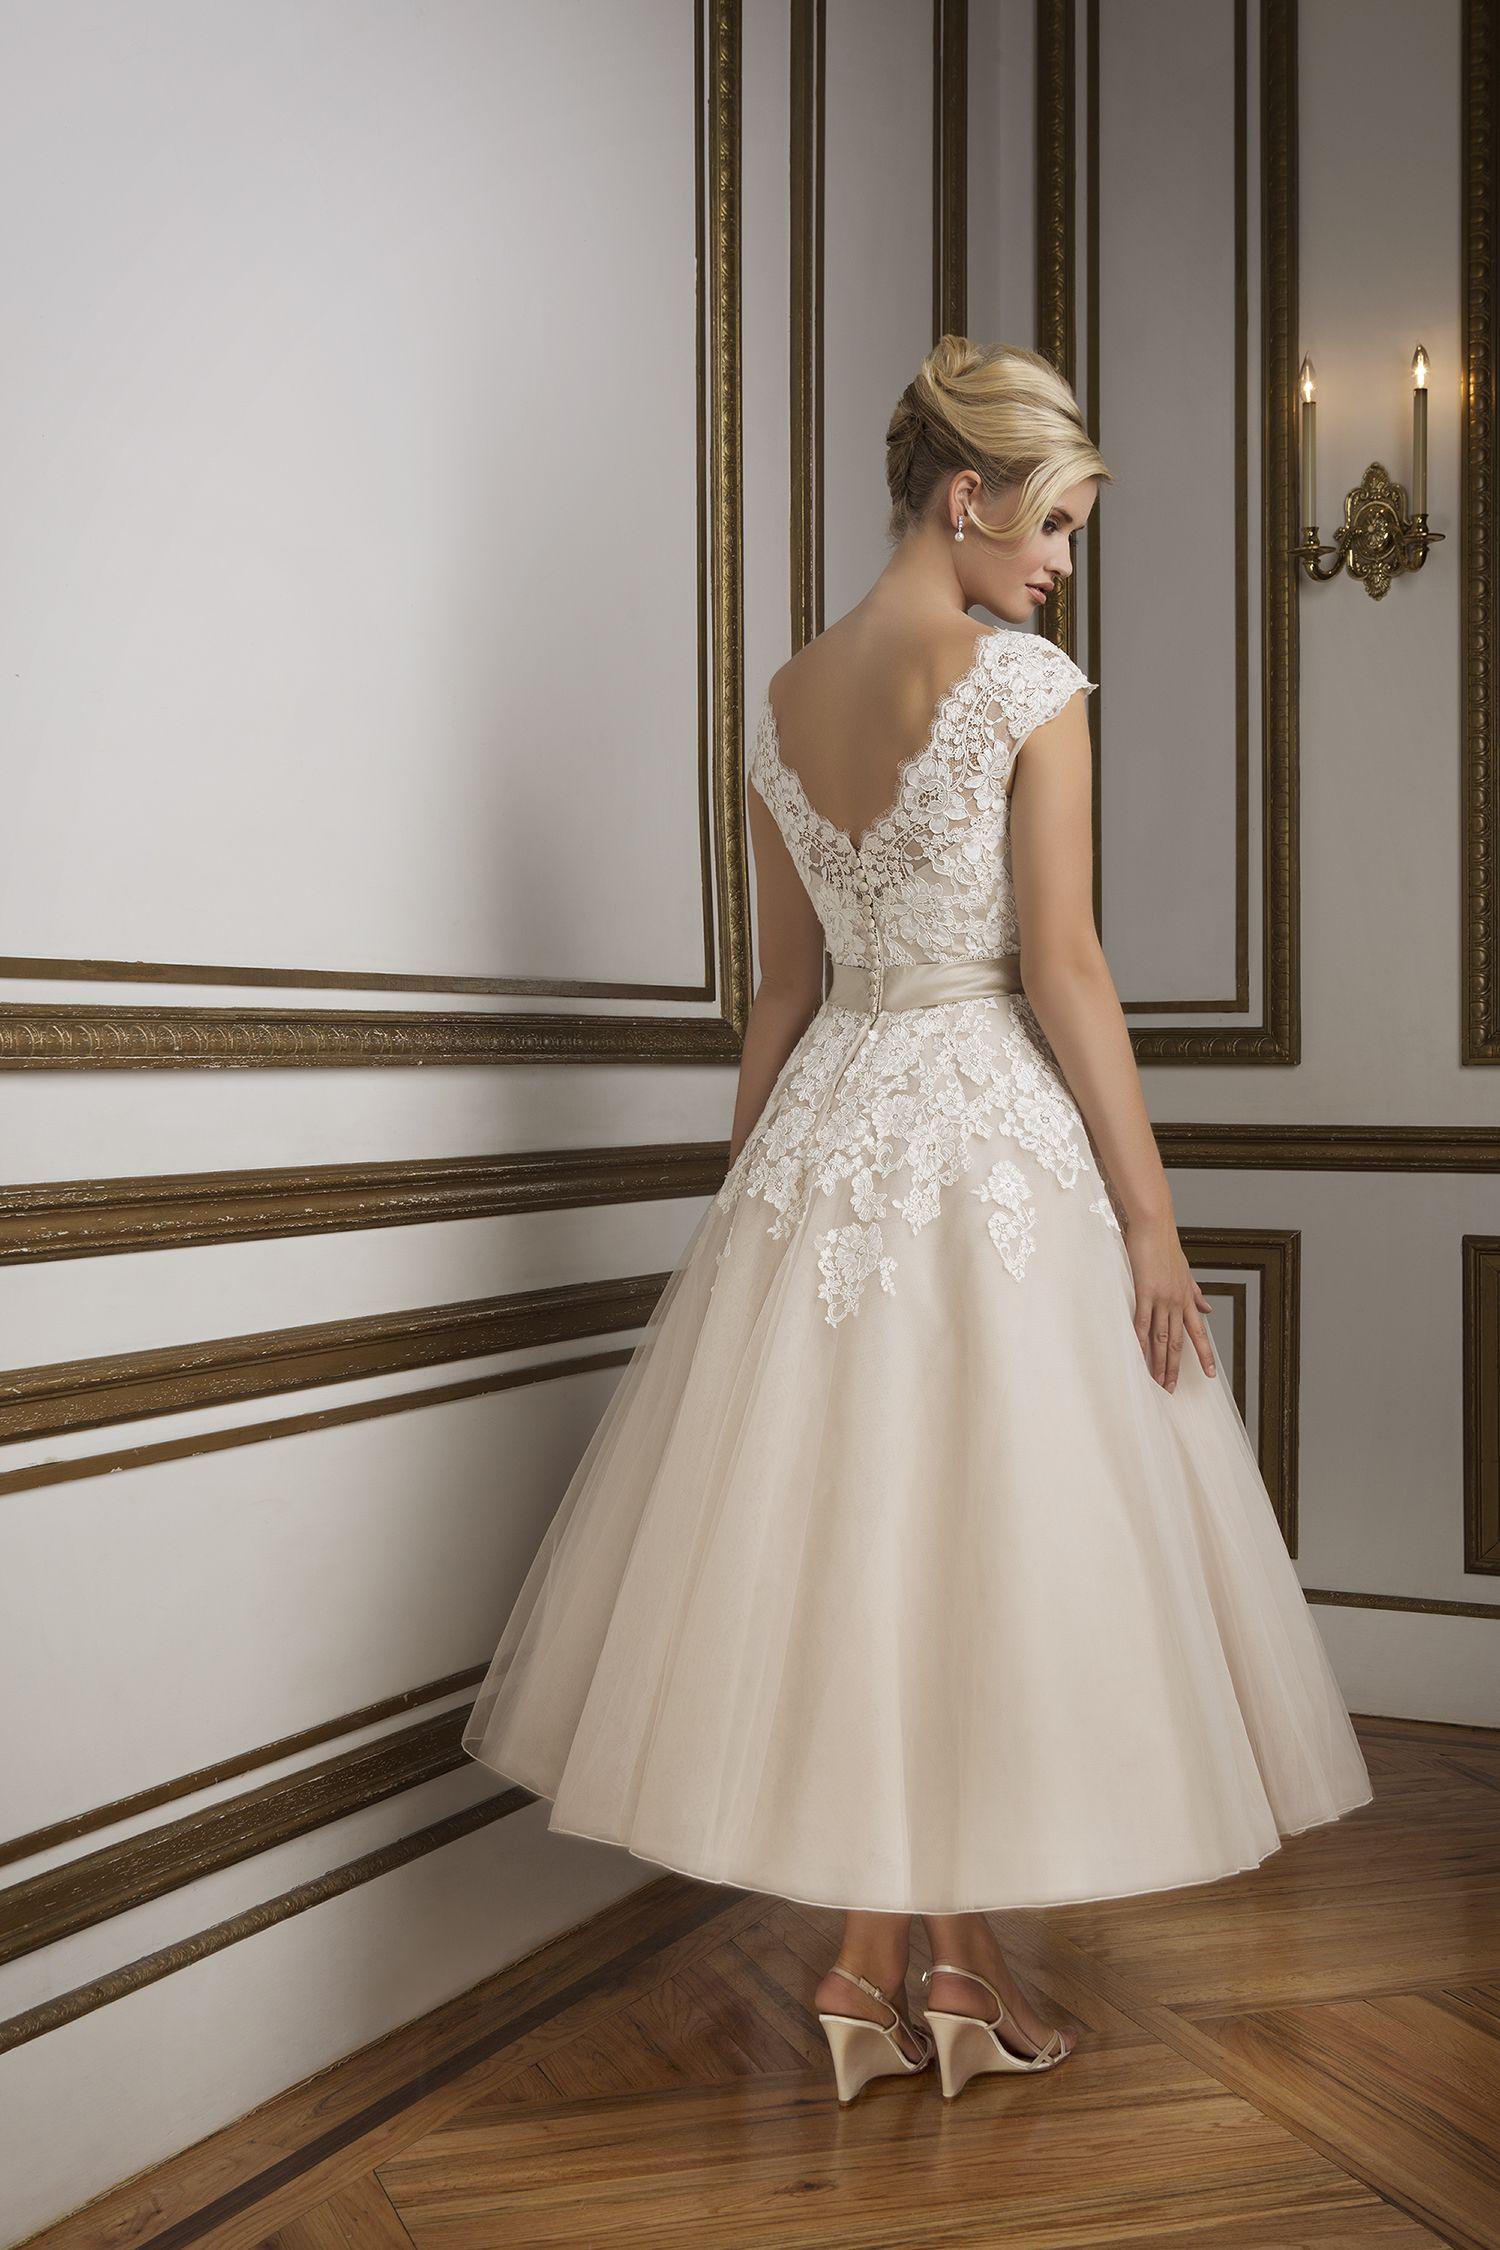 Kurze Brautkleider | Wedding, Wedding dress and Wedding stuff